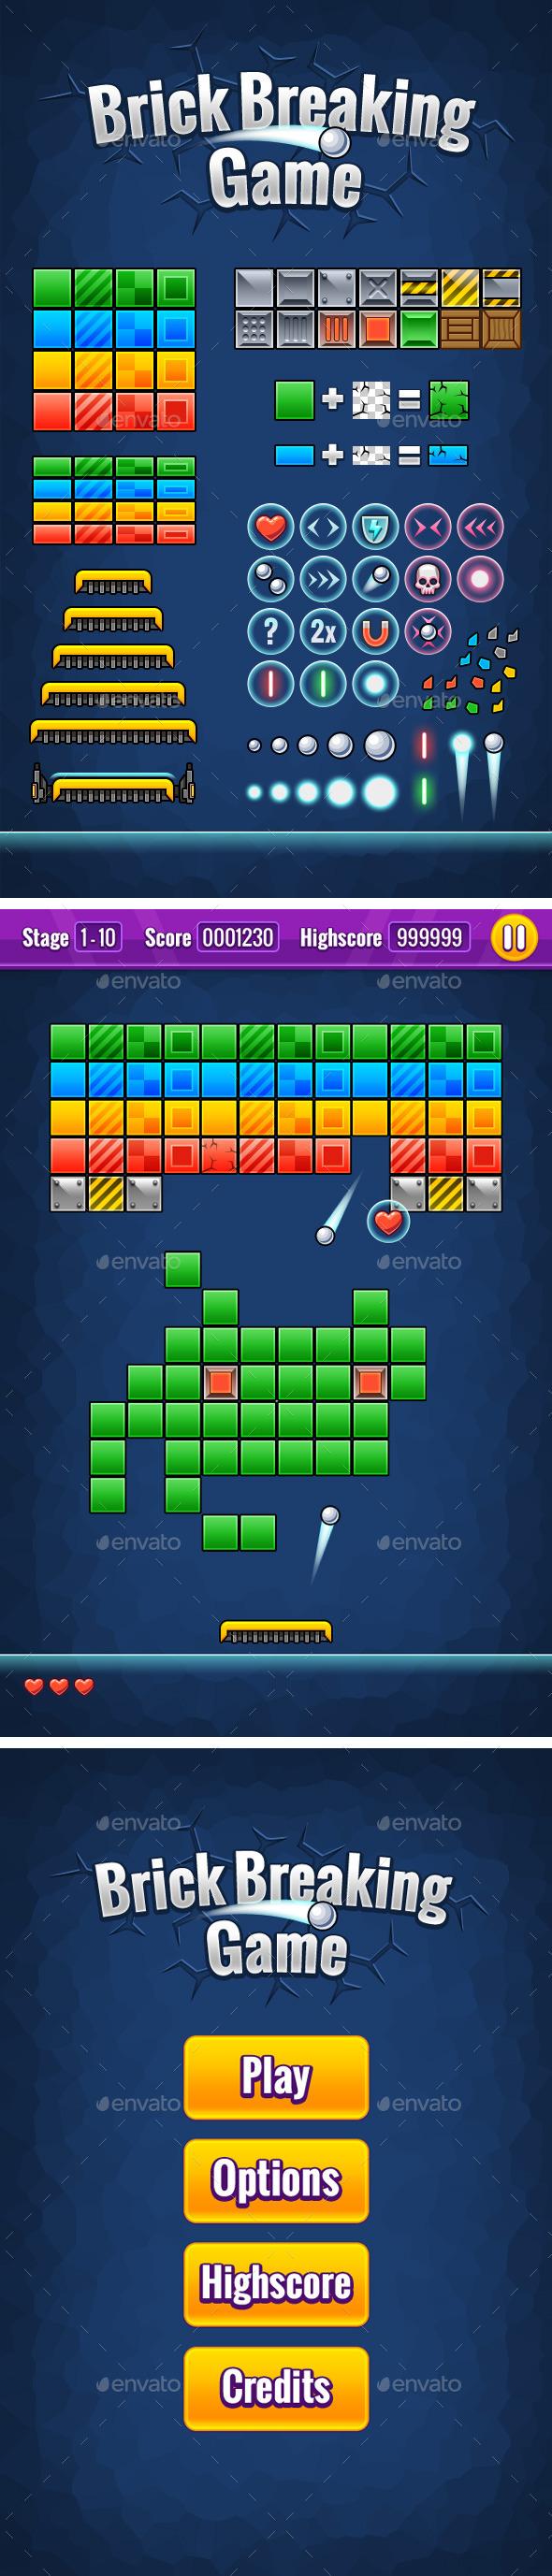 GraphicRiver Brick Breaking Game 8935414